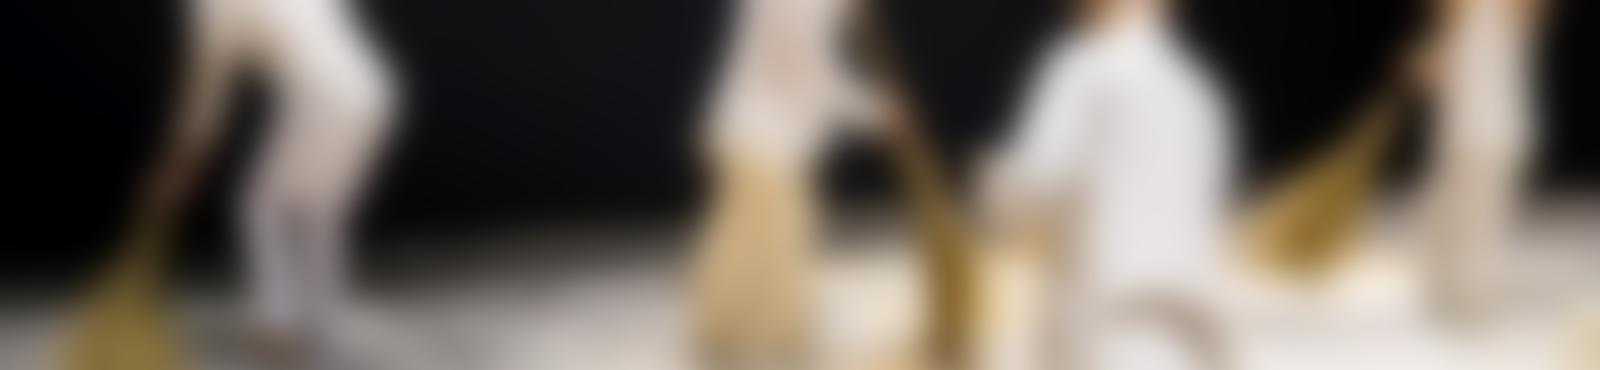 Blurred 7cab7e31 0c64 4016 9c9c 58086ce9e331